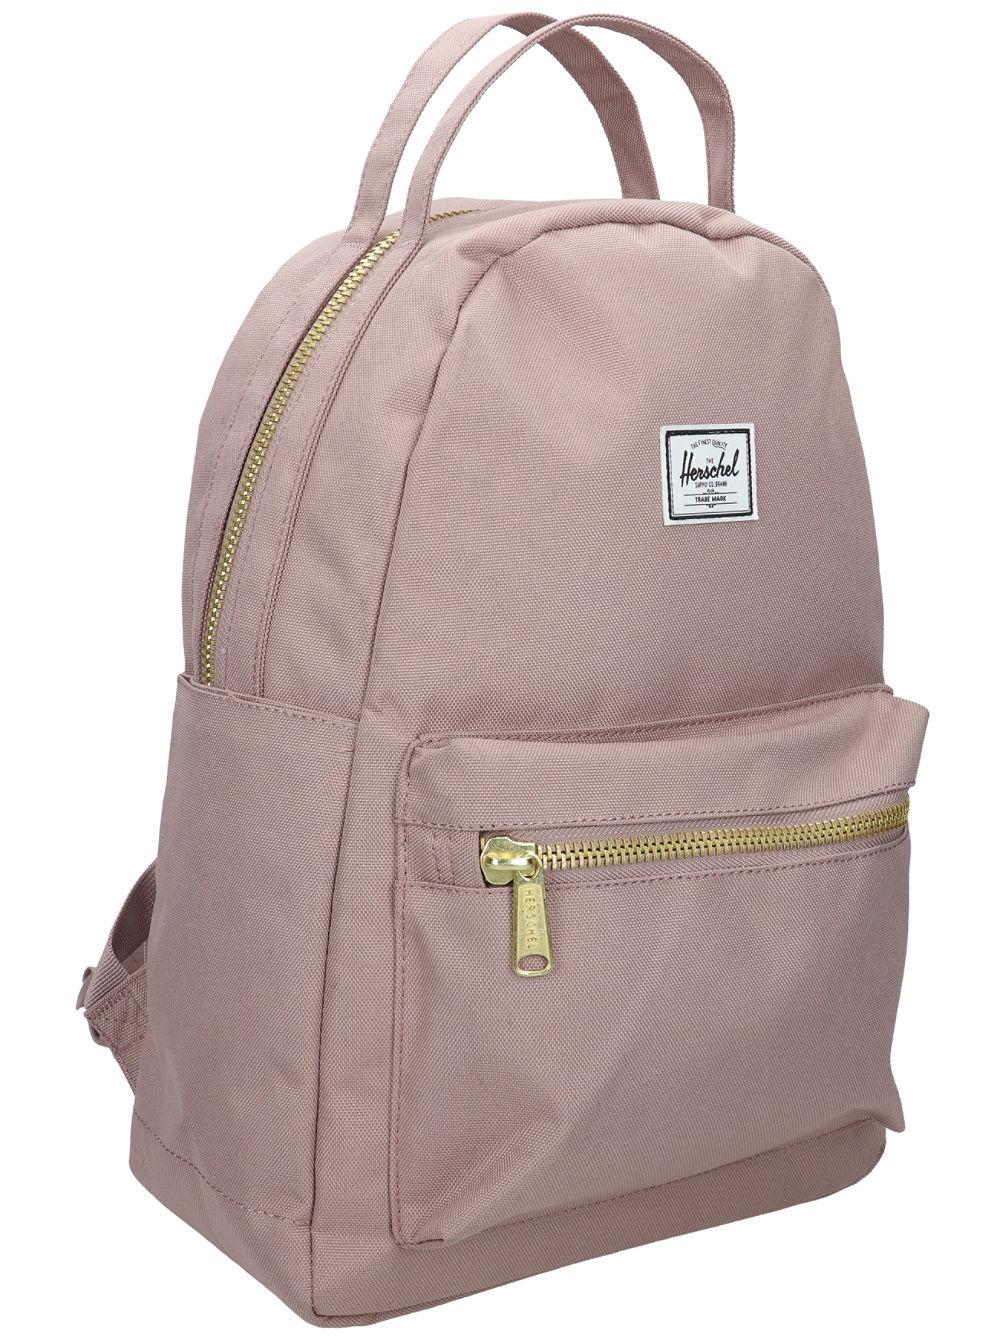 7456b5d35d2 Buy Herschel Nova X-Small Backpack online at Blue Tomato